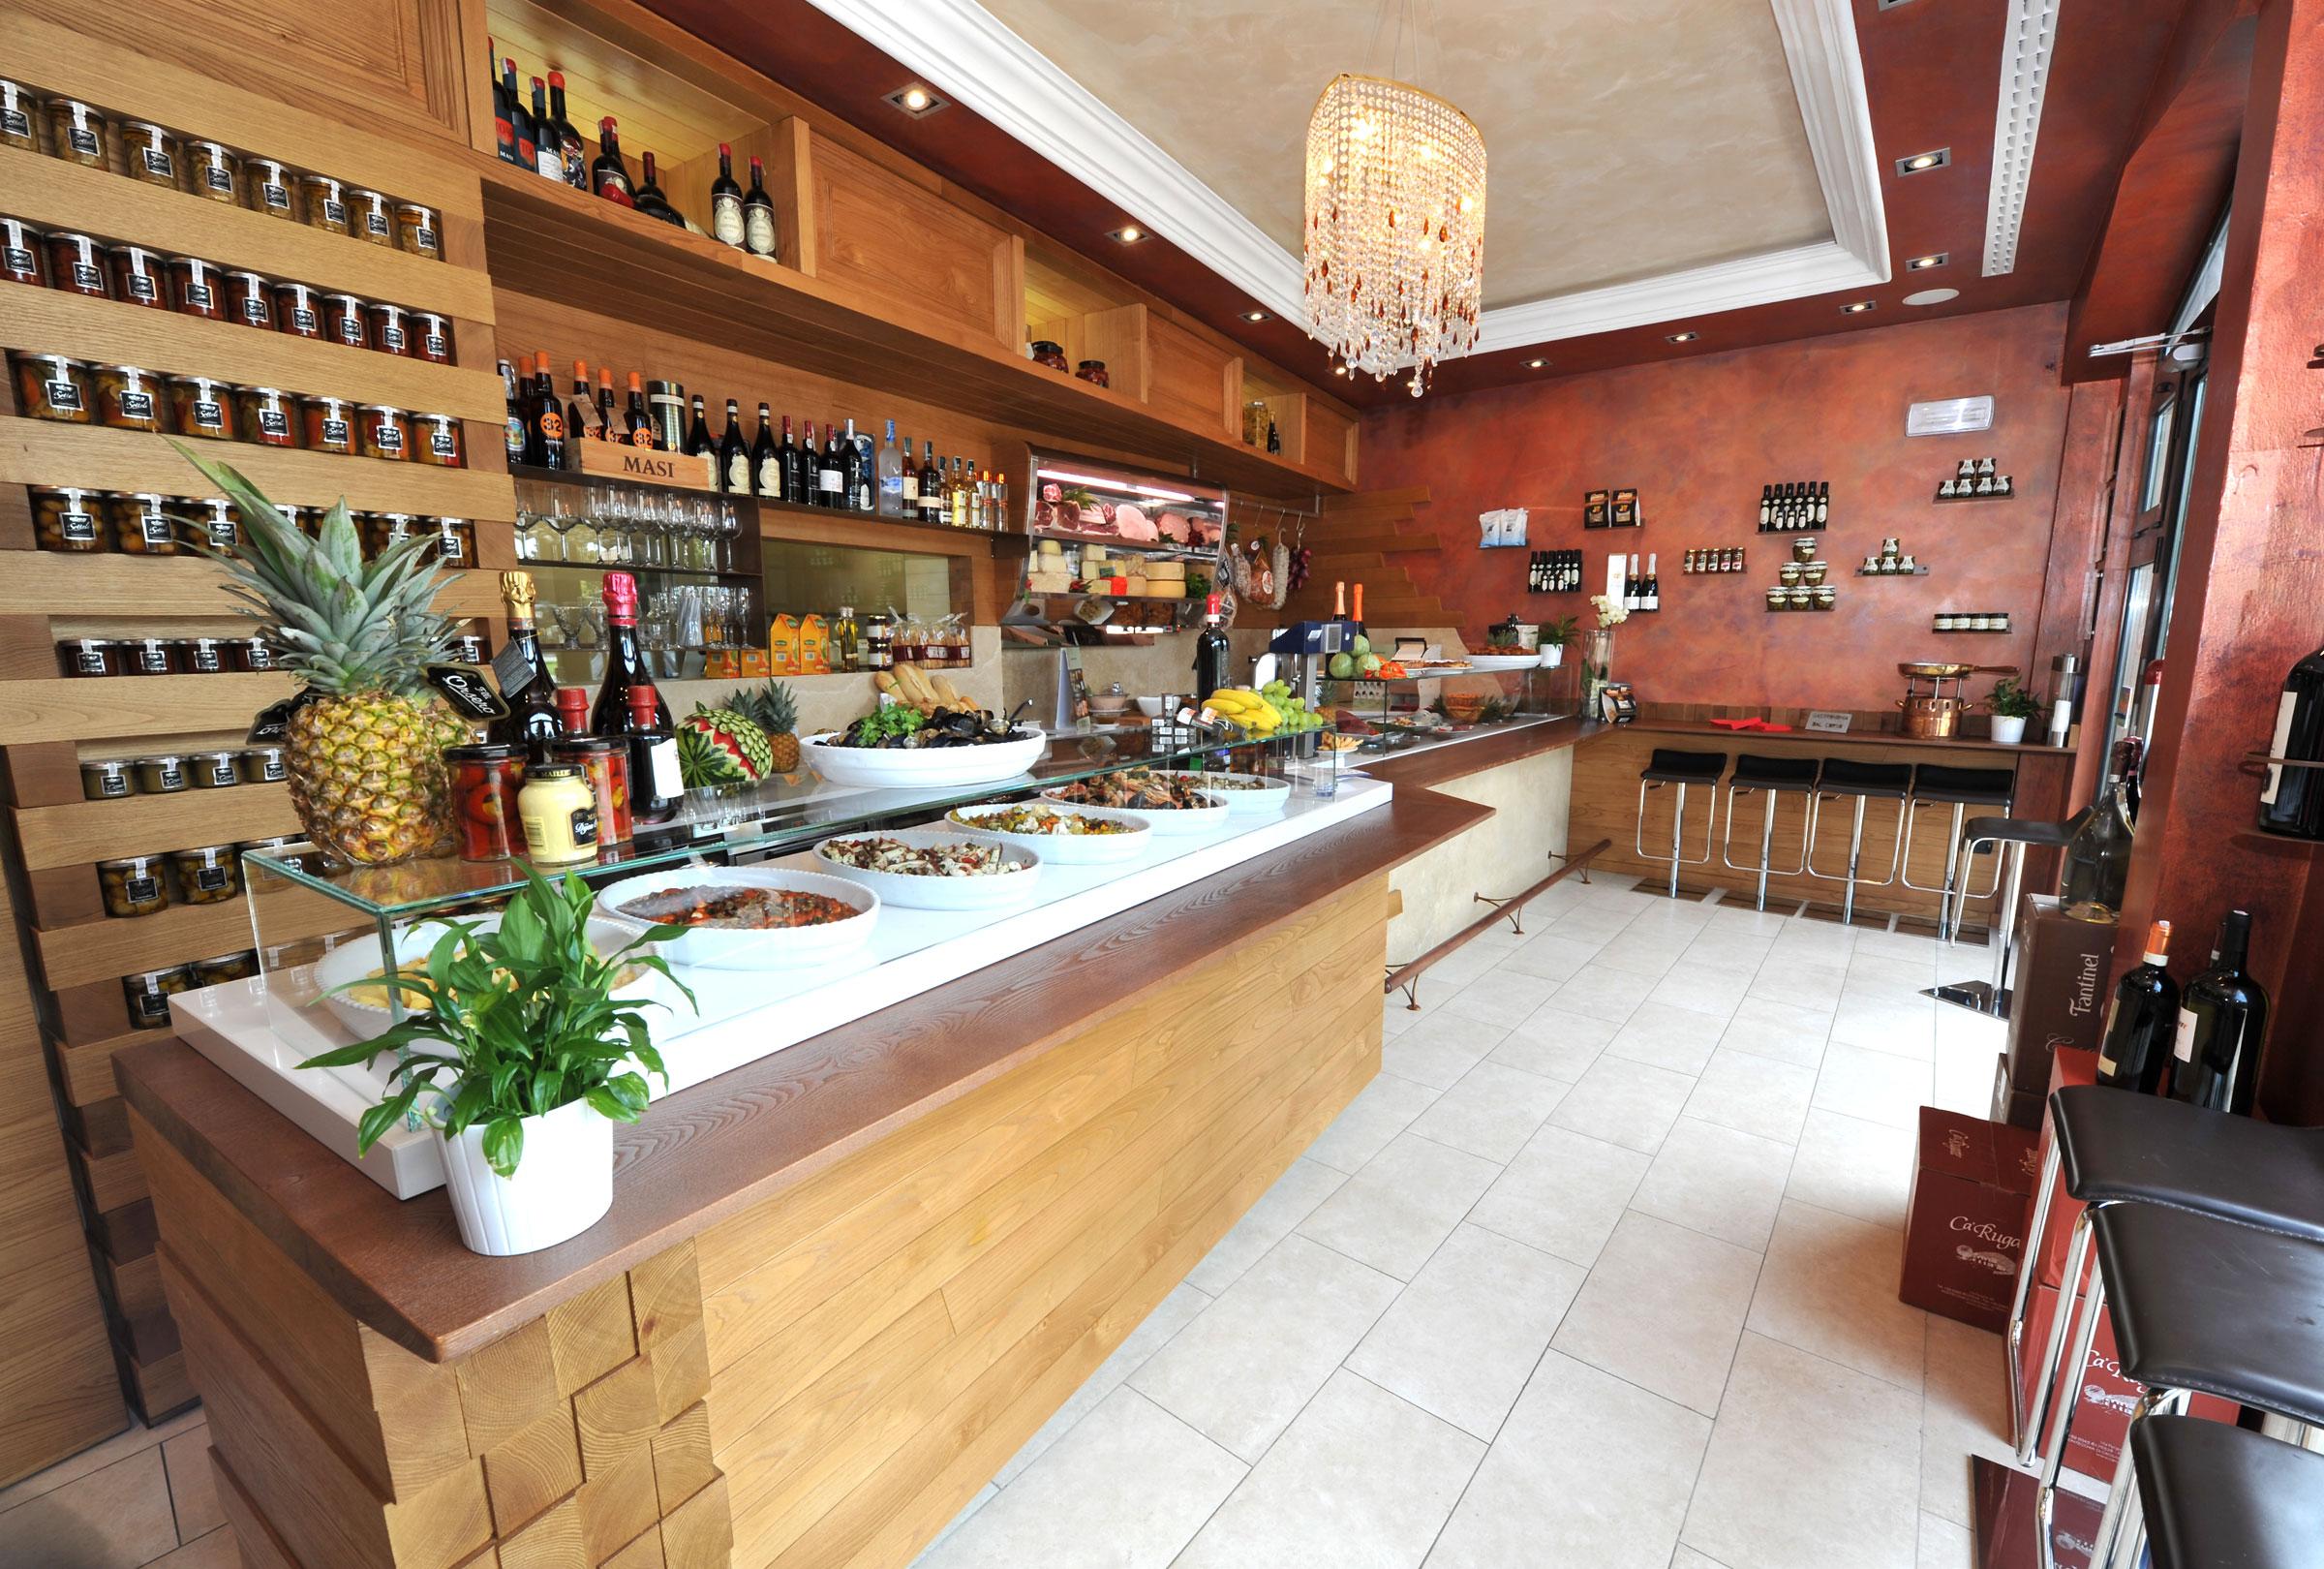 Arredamento gastronomia dal corso for Corso arredamento